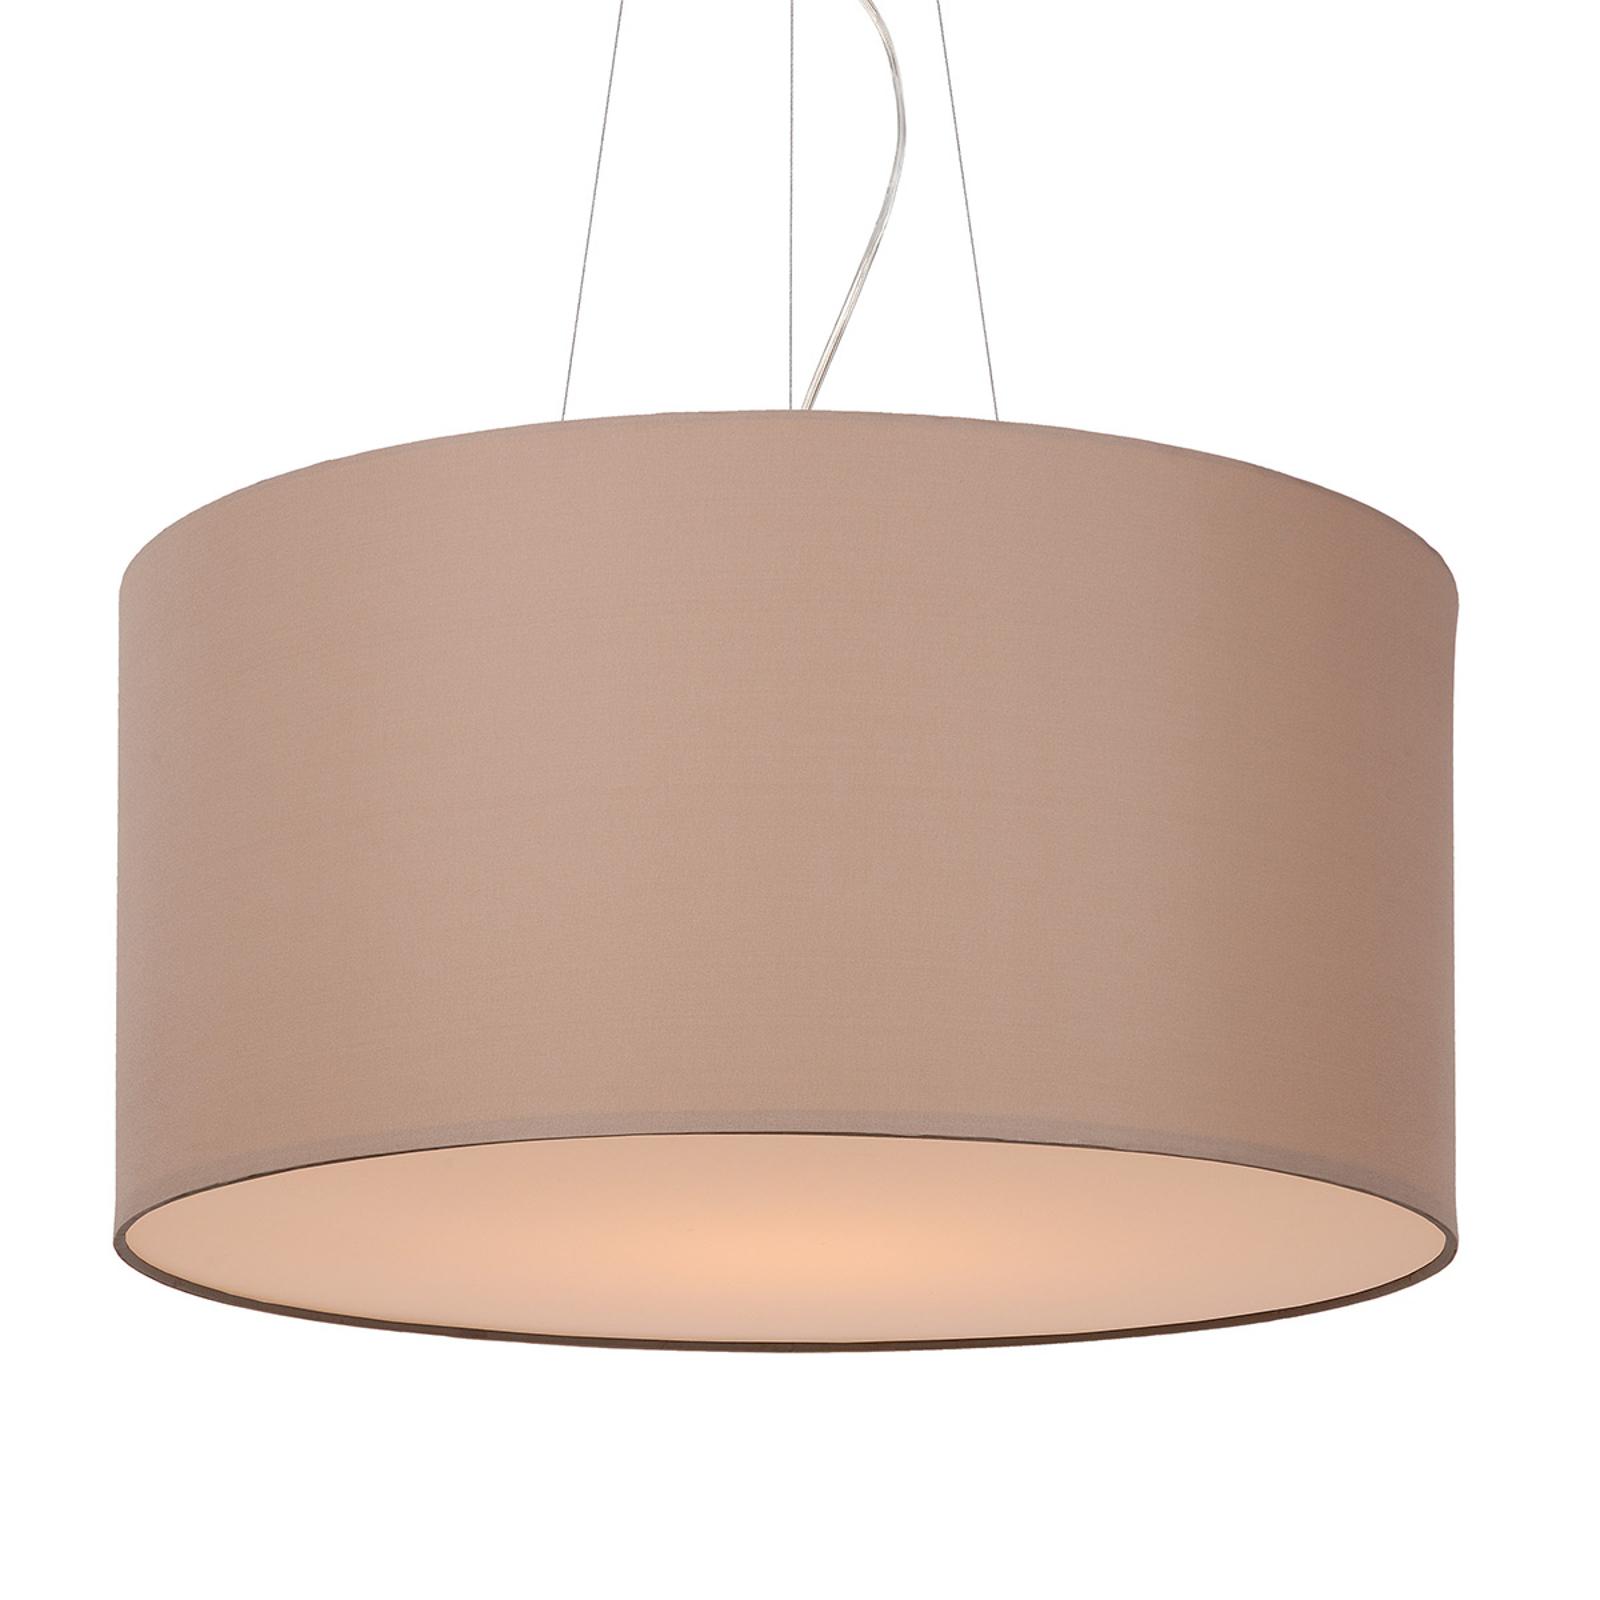 Universele hanglamp Coral, taupe, 60 cm